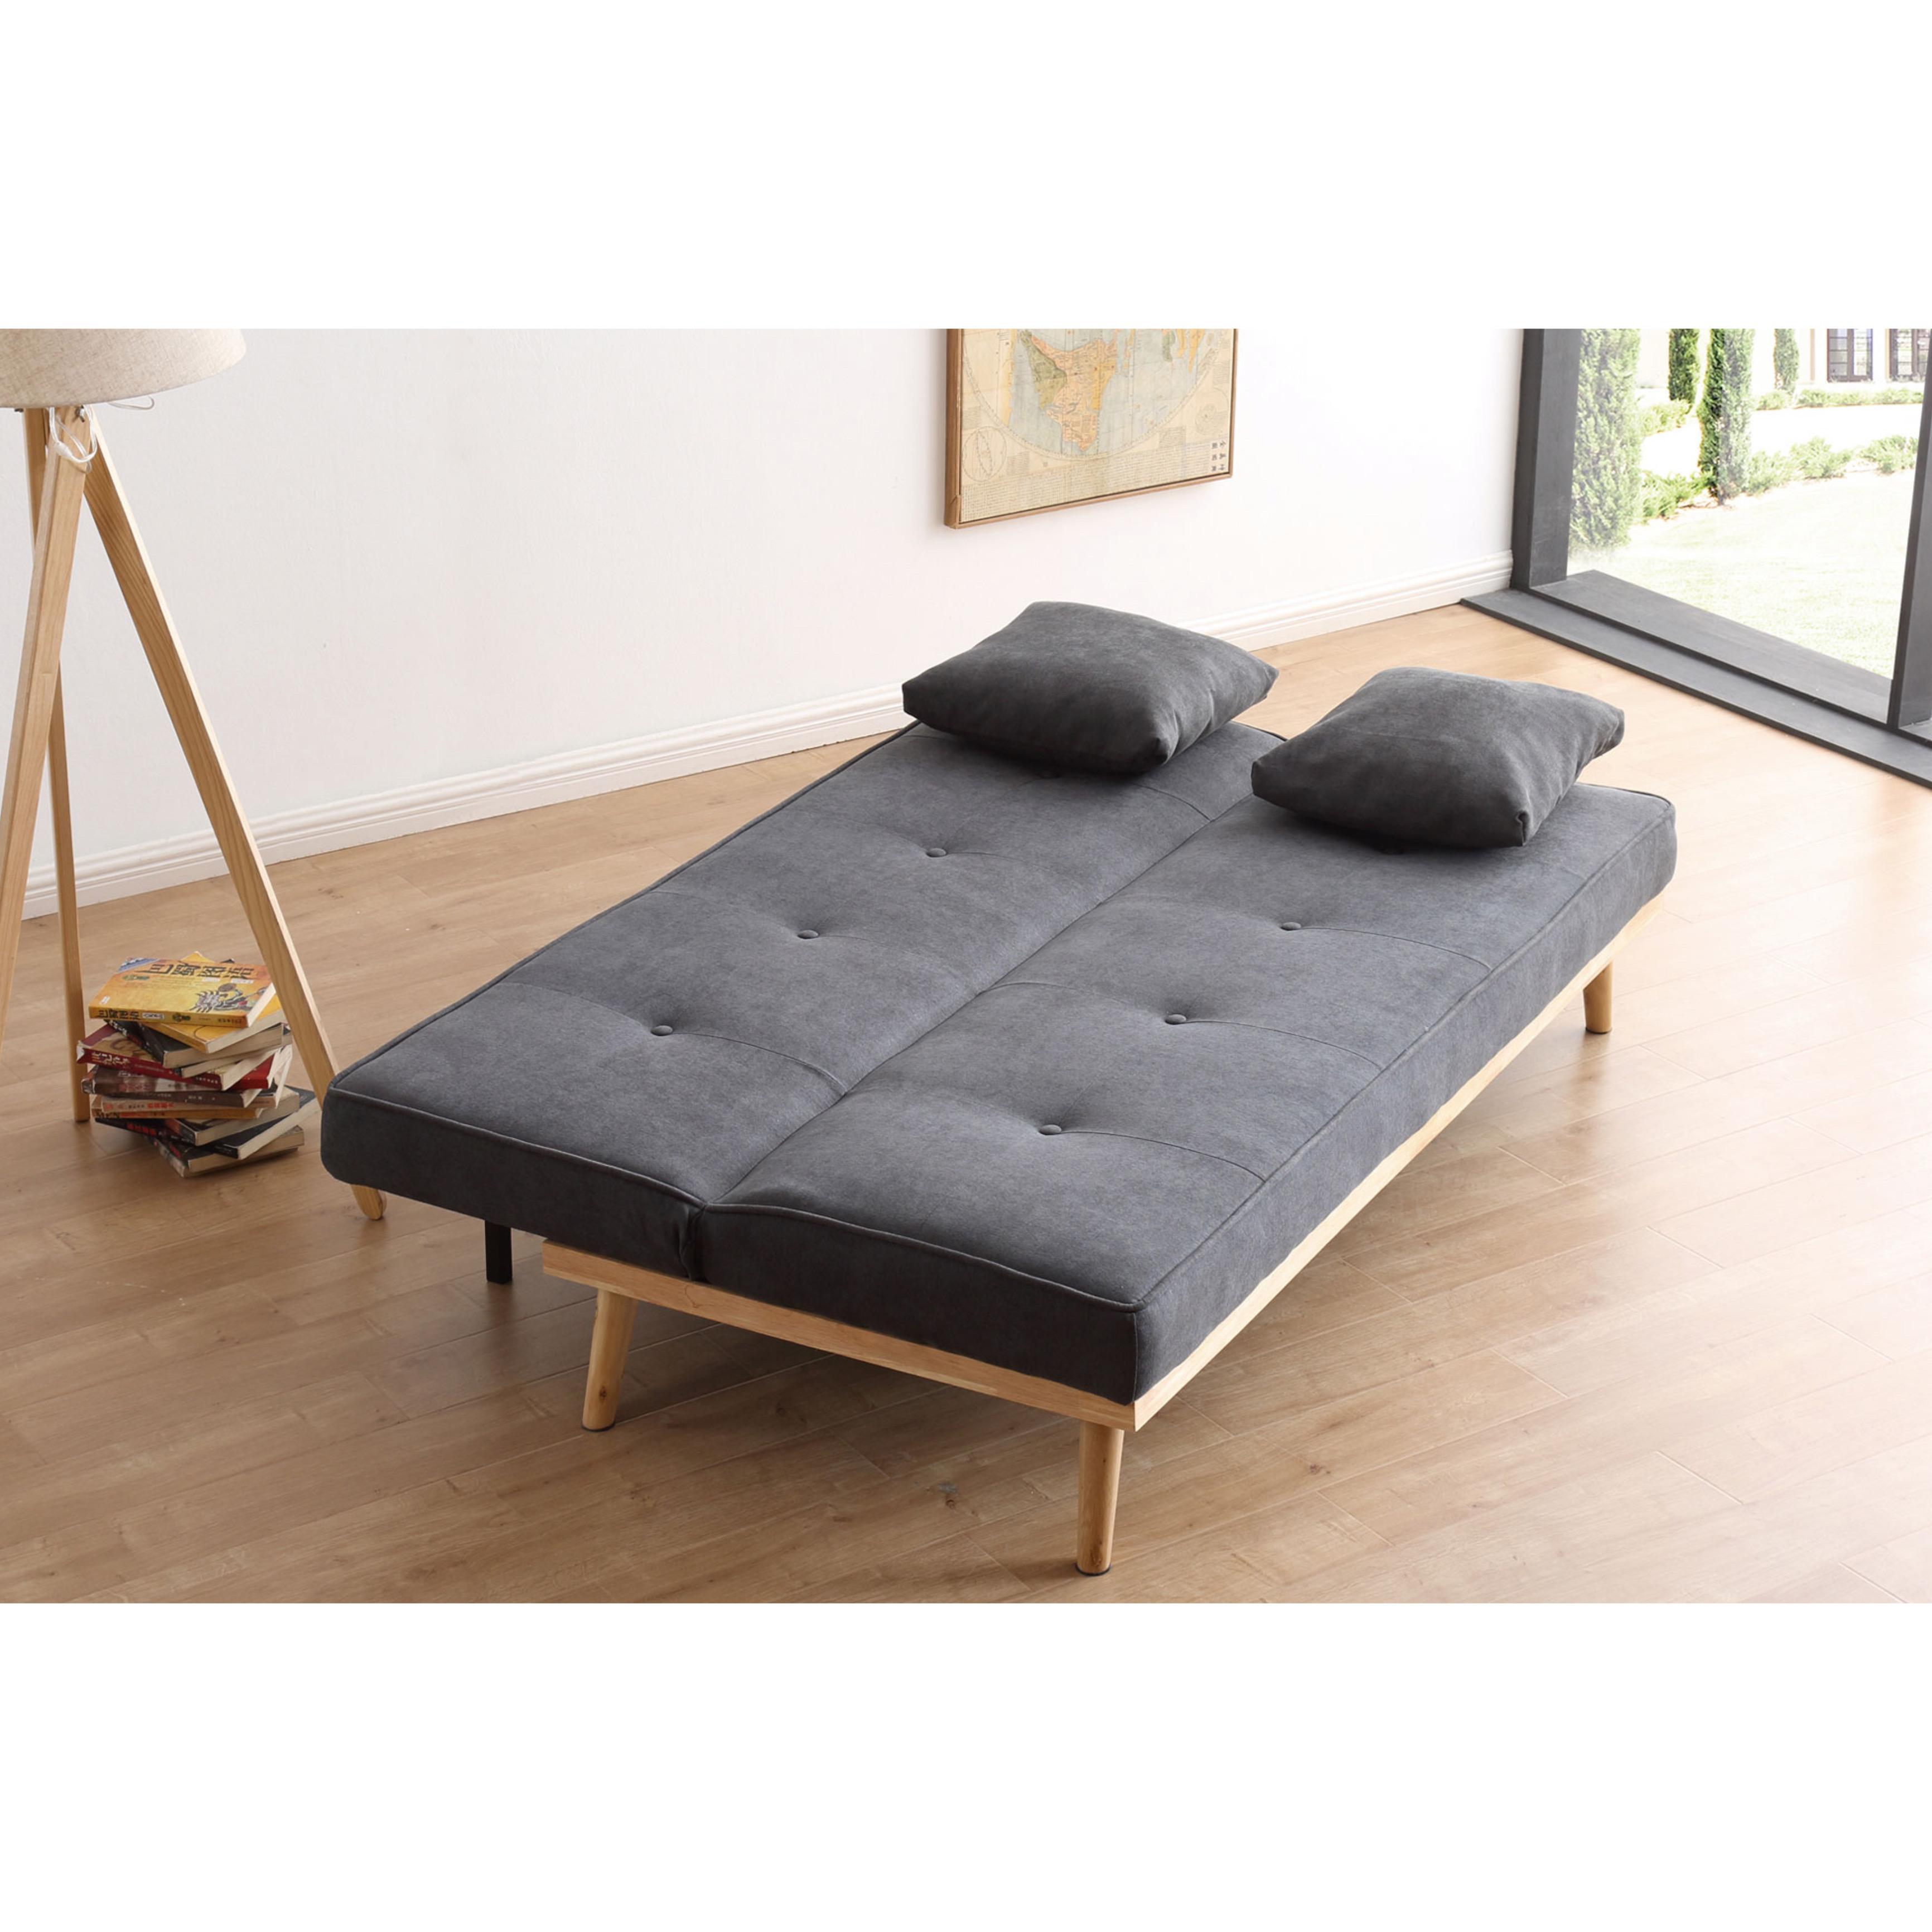 28441-sofa-cama-click-house-2.jpeg